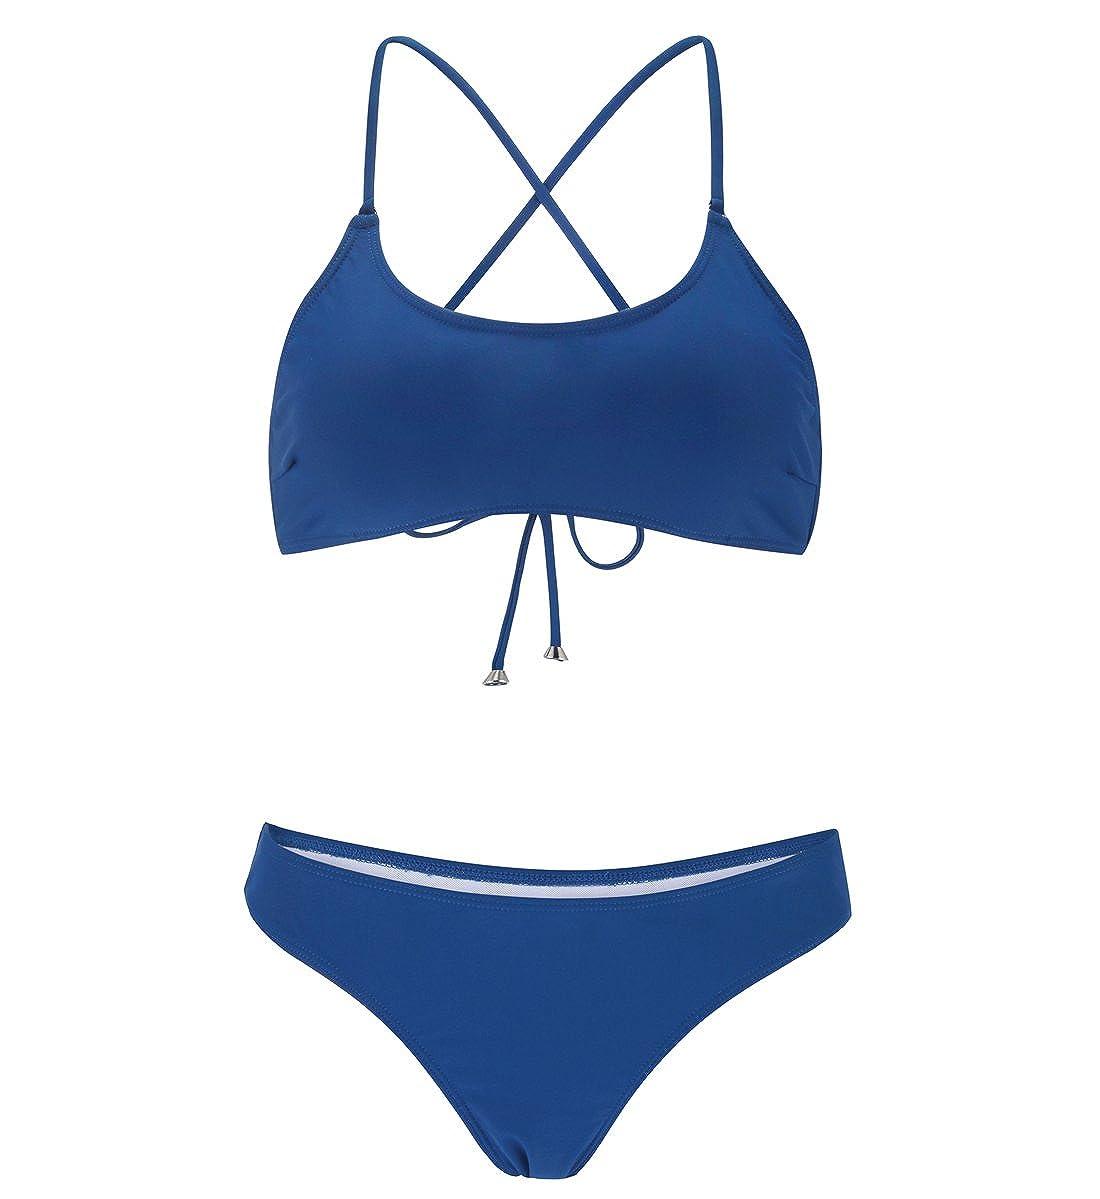 bluee stripsky Strappy Cross Back Bikini Set, Sporty Padded Solid Floral Print Brazilian Swimsuit for Women